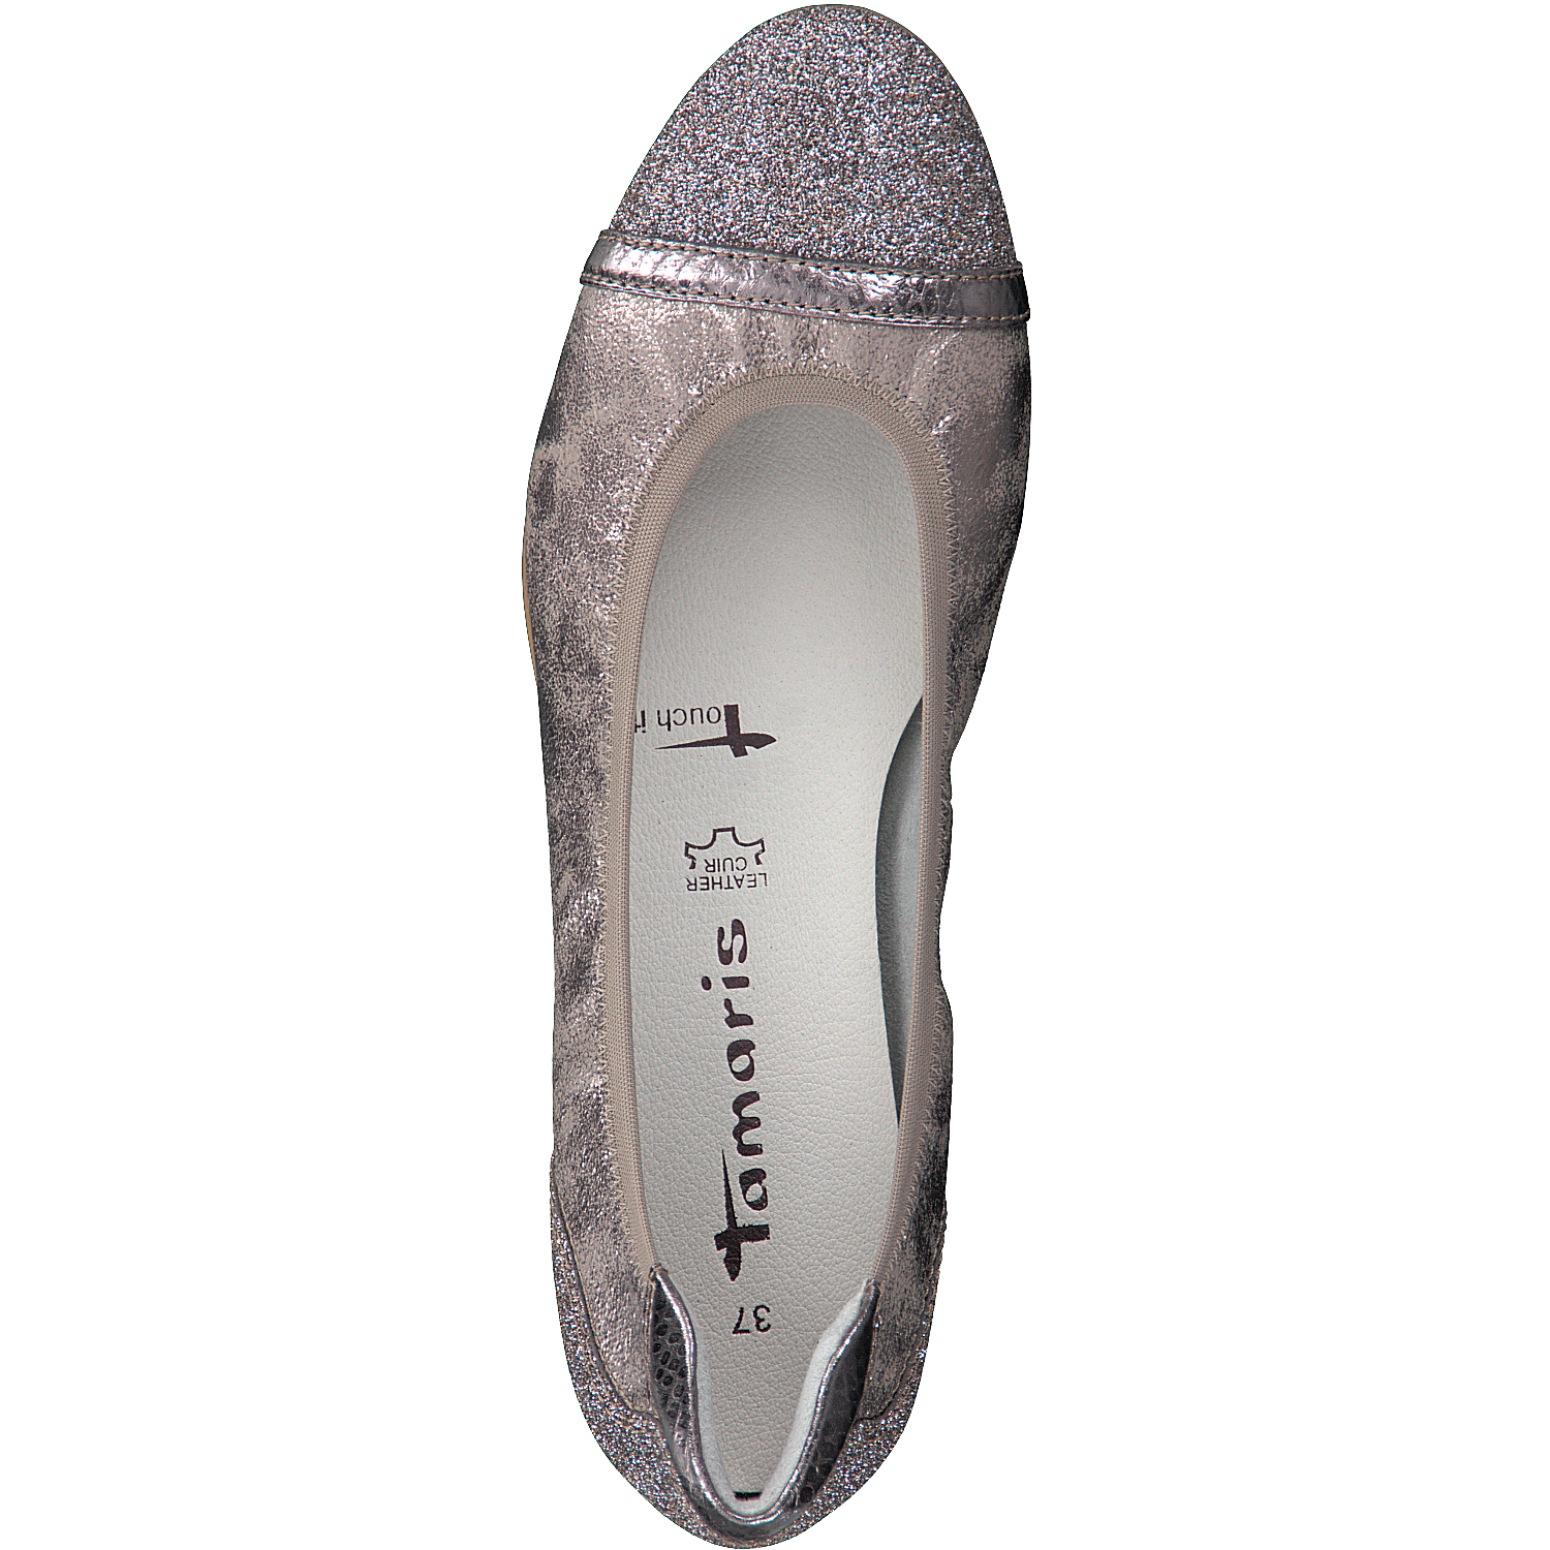 half off 6c9e8 88f90 Tamaris Damen Ballerina 1-22139-20-301 pepper metallic